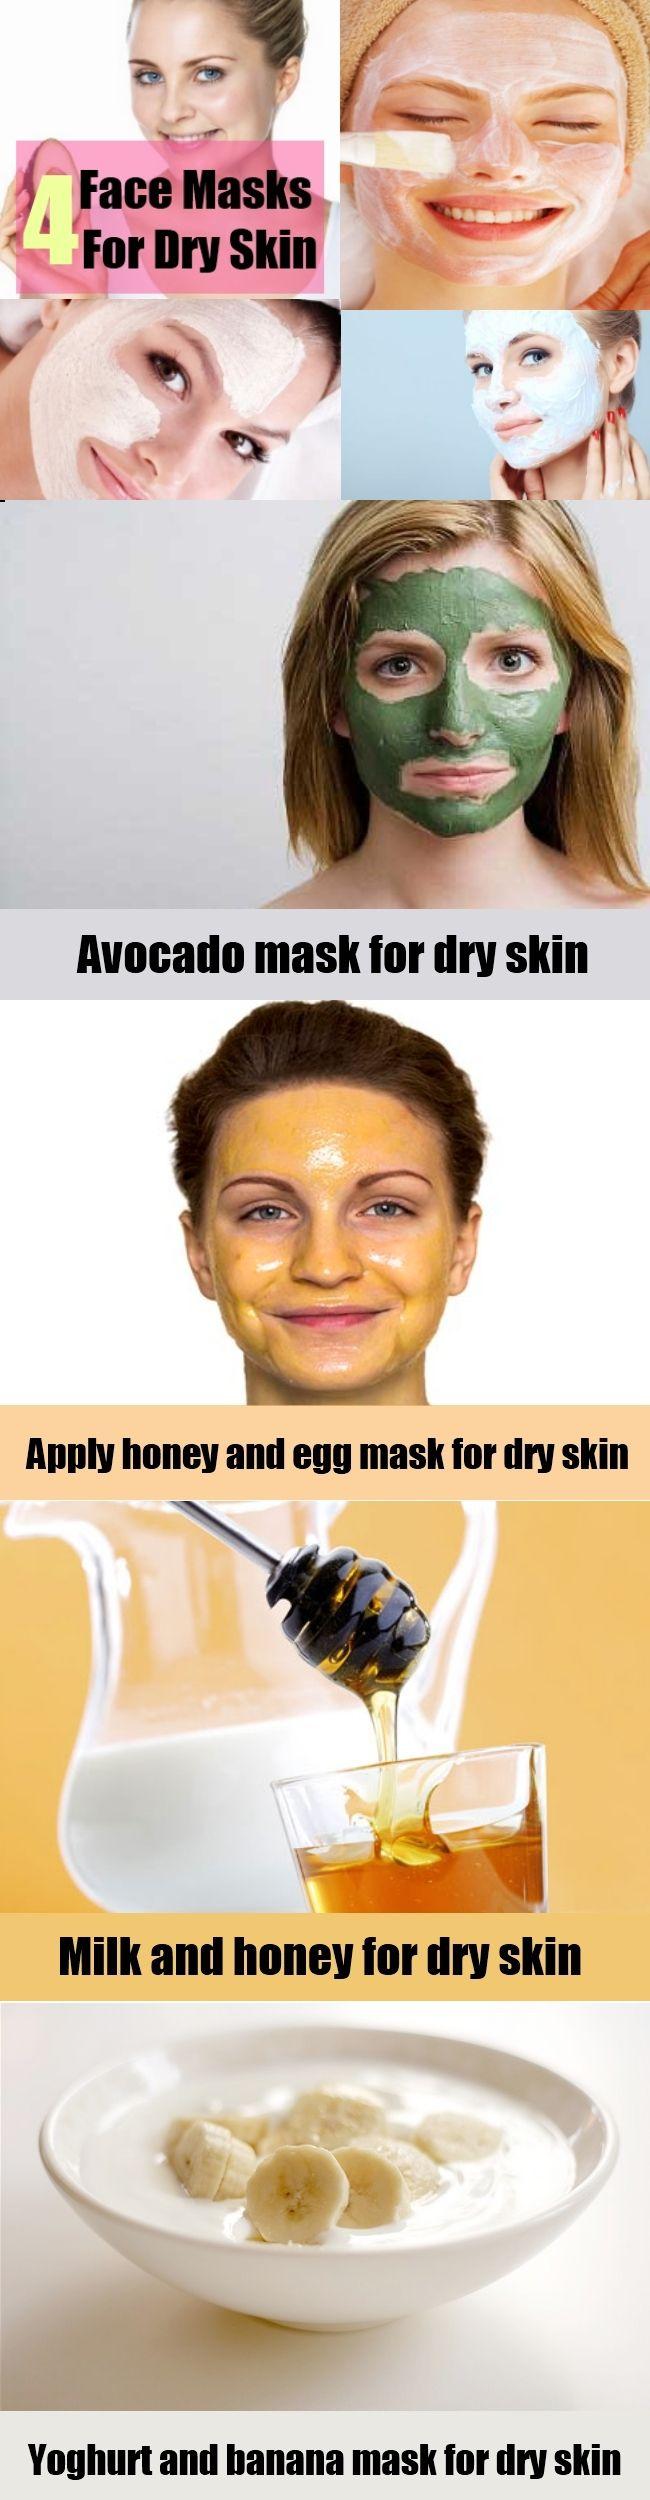 4 Natural Face Masks For Dry Skin